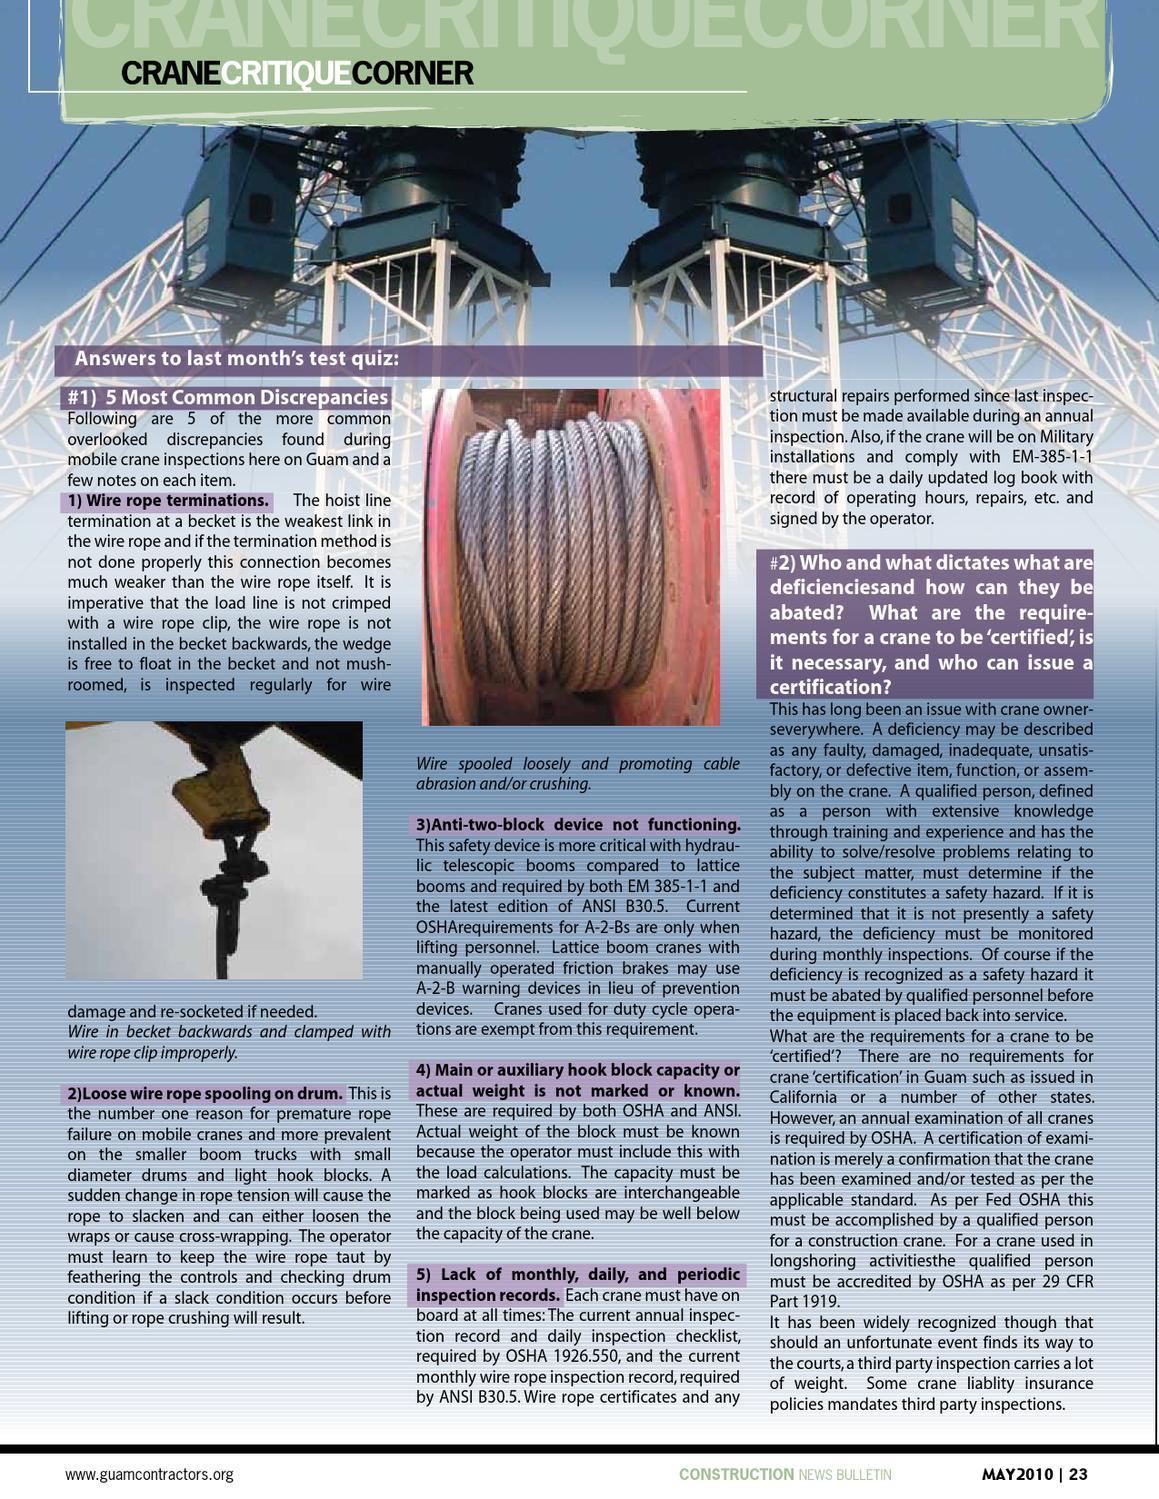 GCA Construction News Bulletin May 2010 by Geri Leon